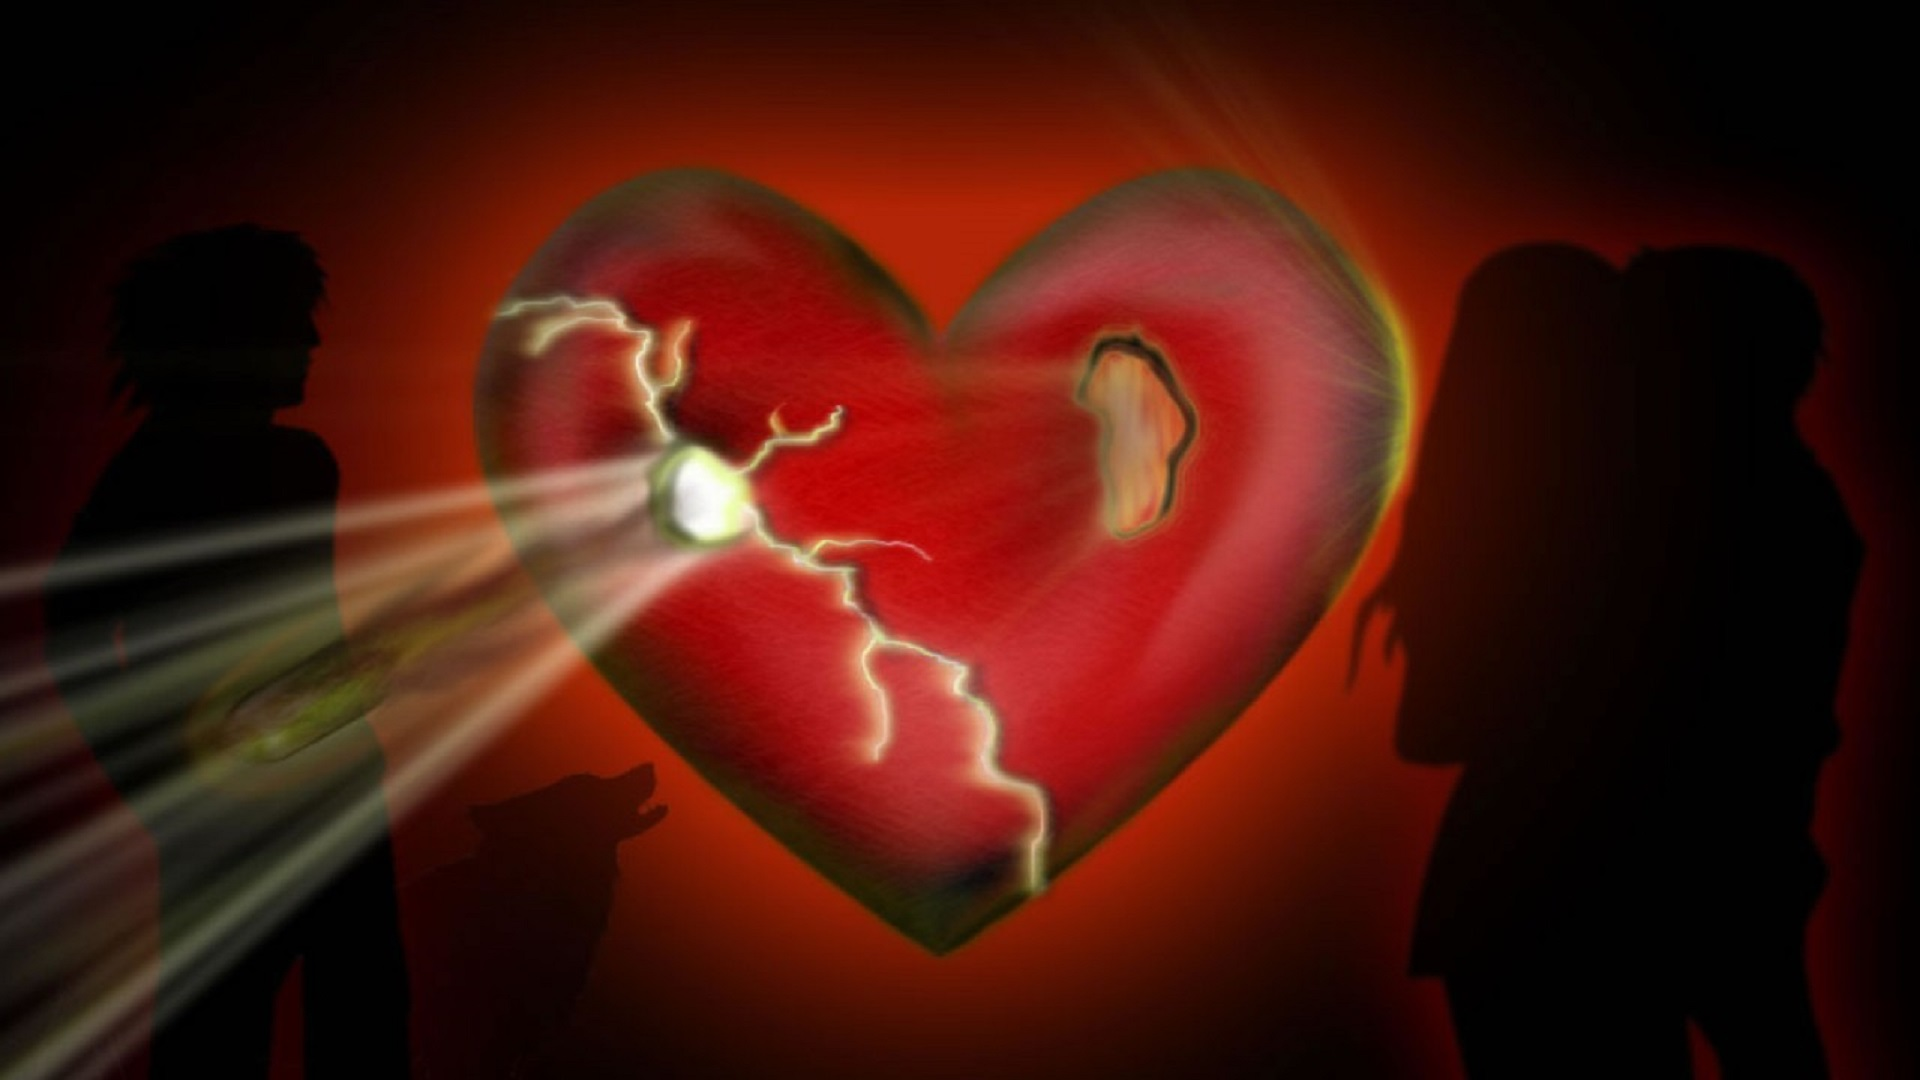 4K Broken Heart Wallpapers High Quality   Download Free